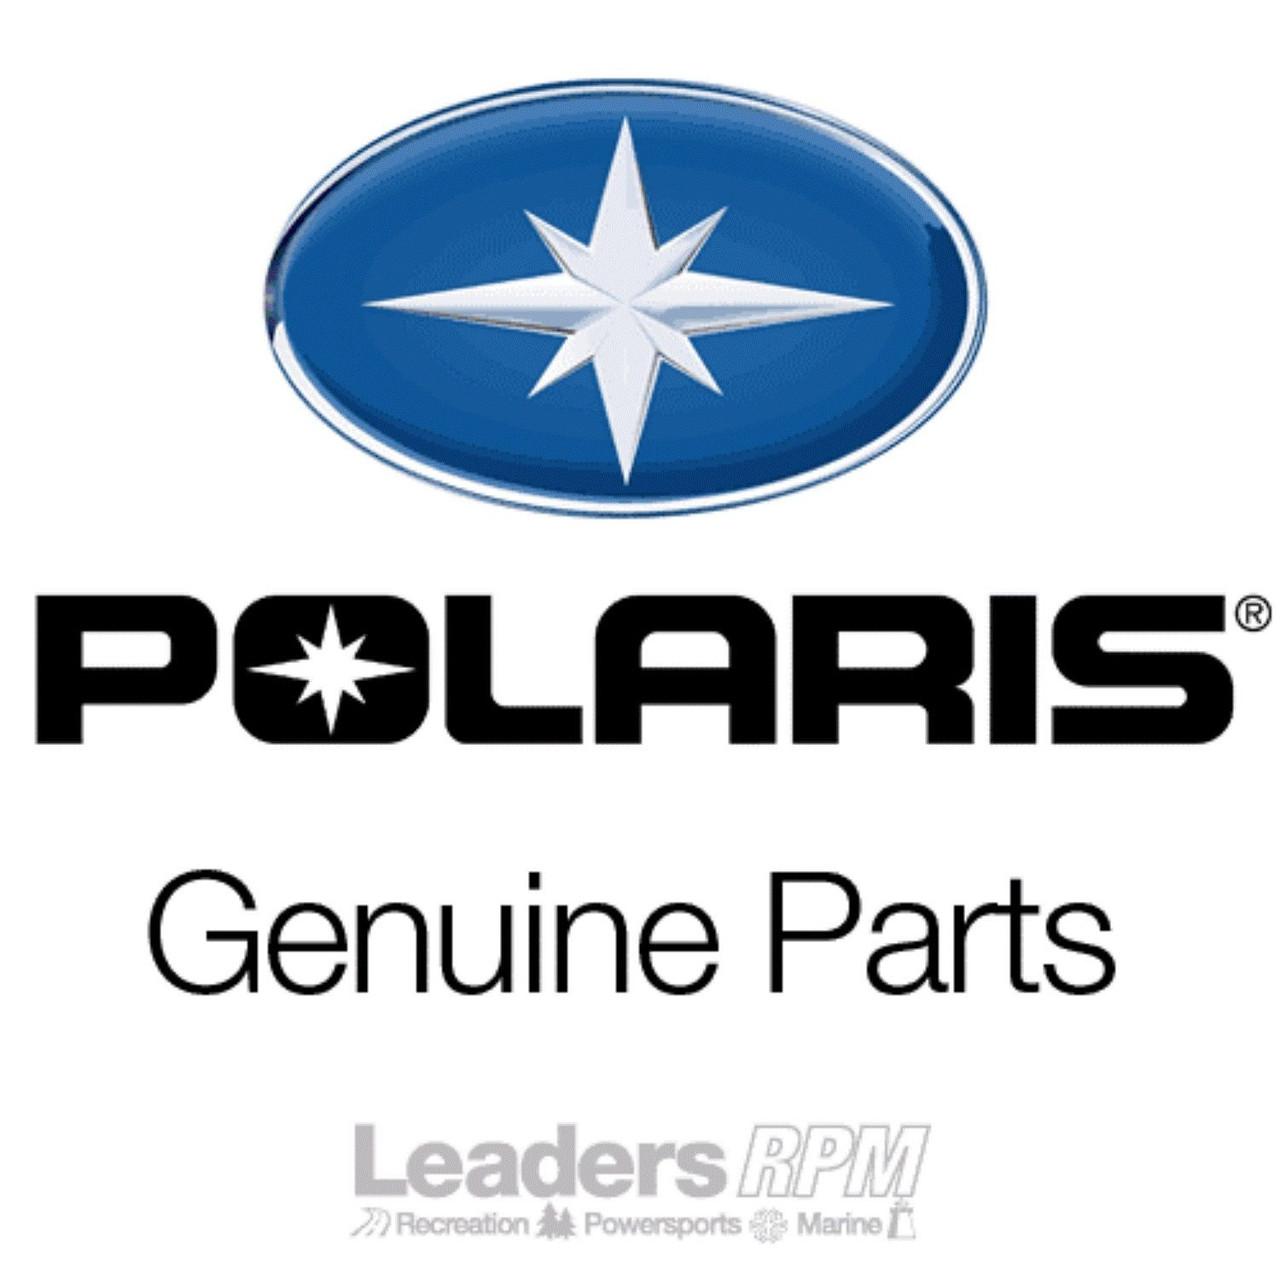 7081212 New Cable Throttle For 2005-2012 Polaris Ranger 400 4x4 Ranger 500 2X4 4x4